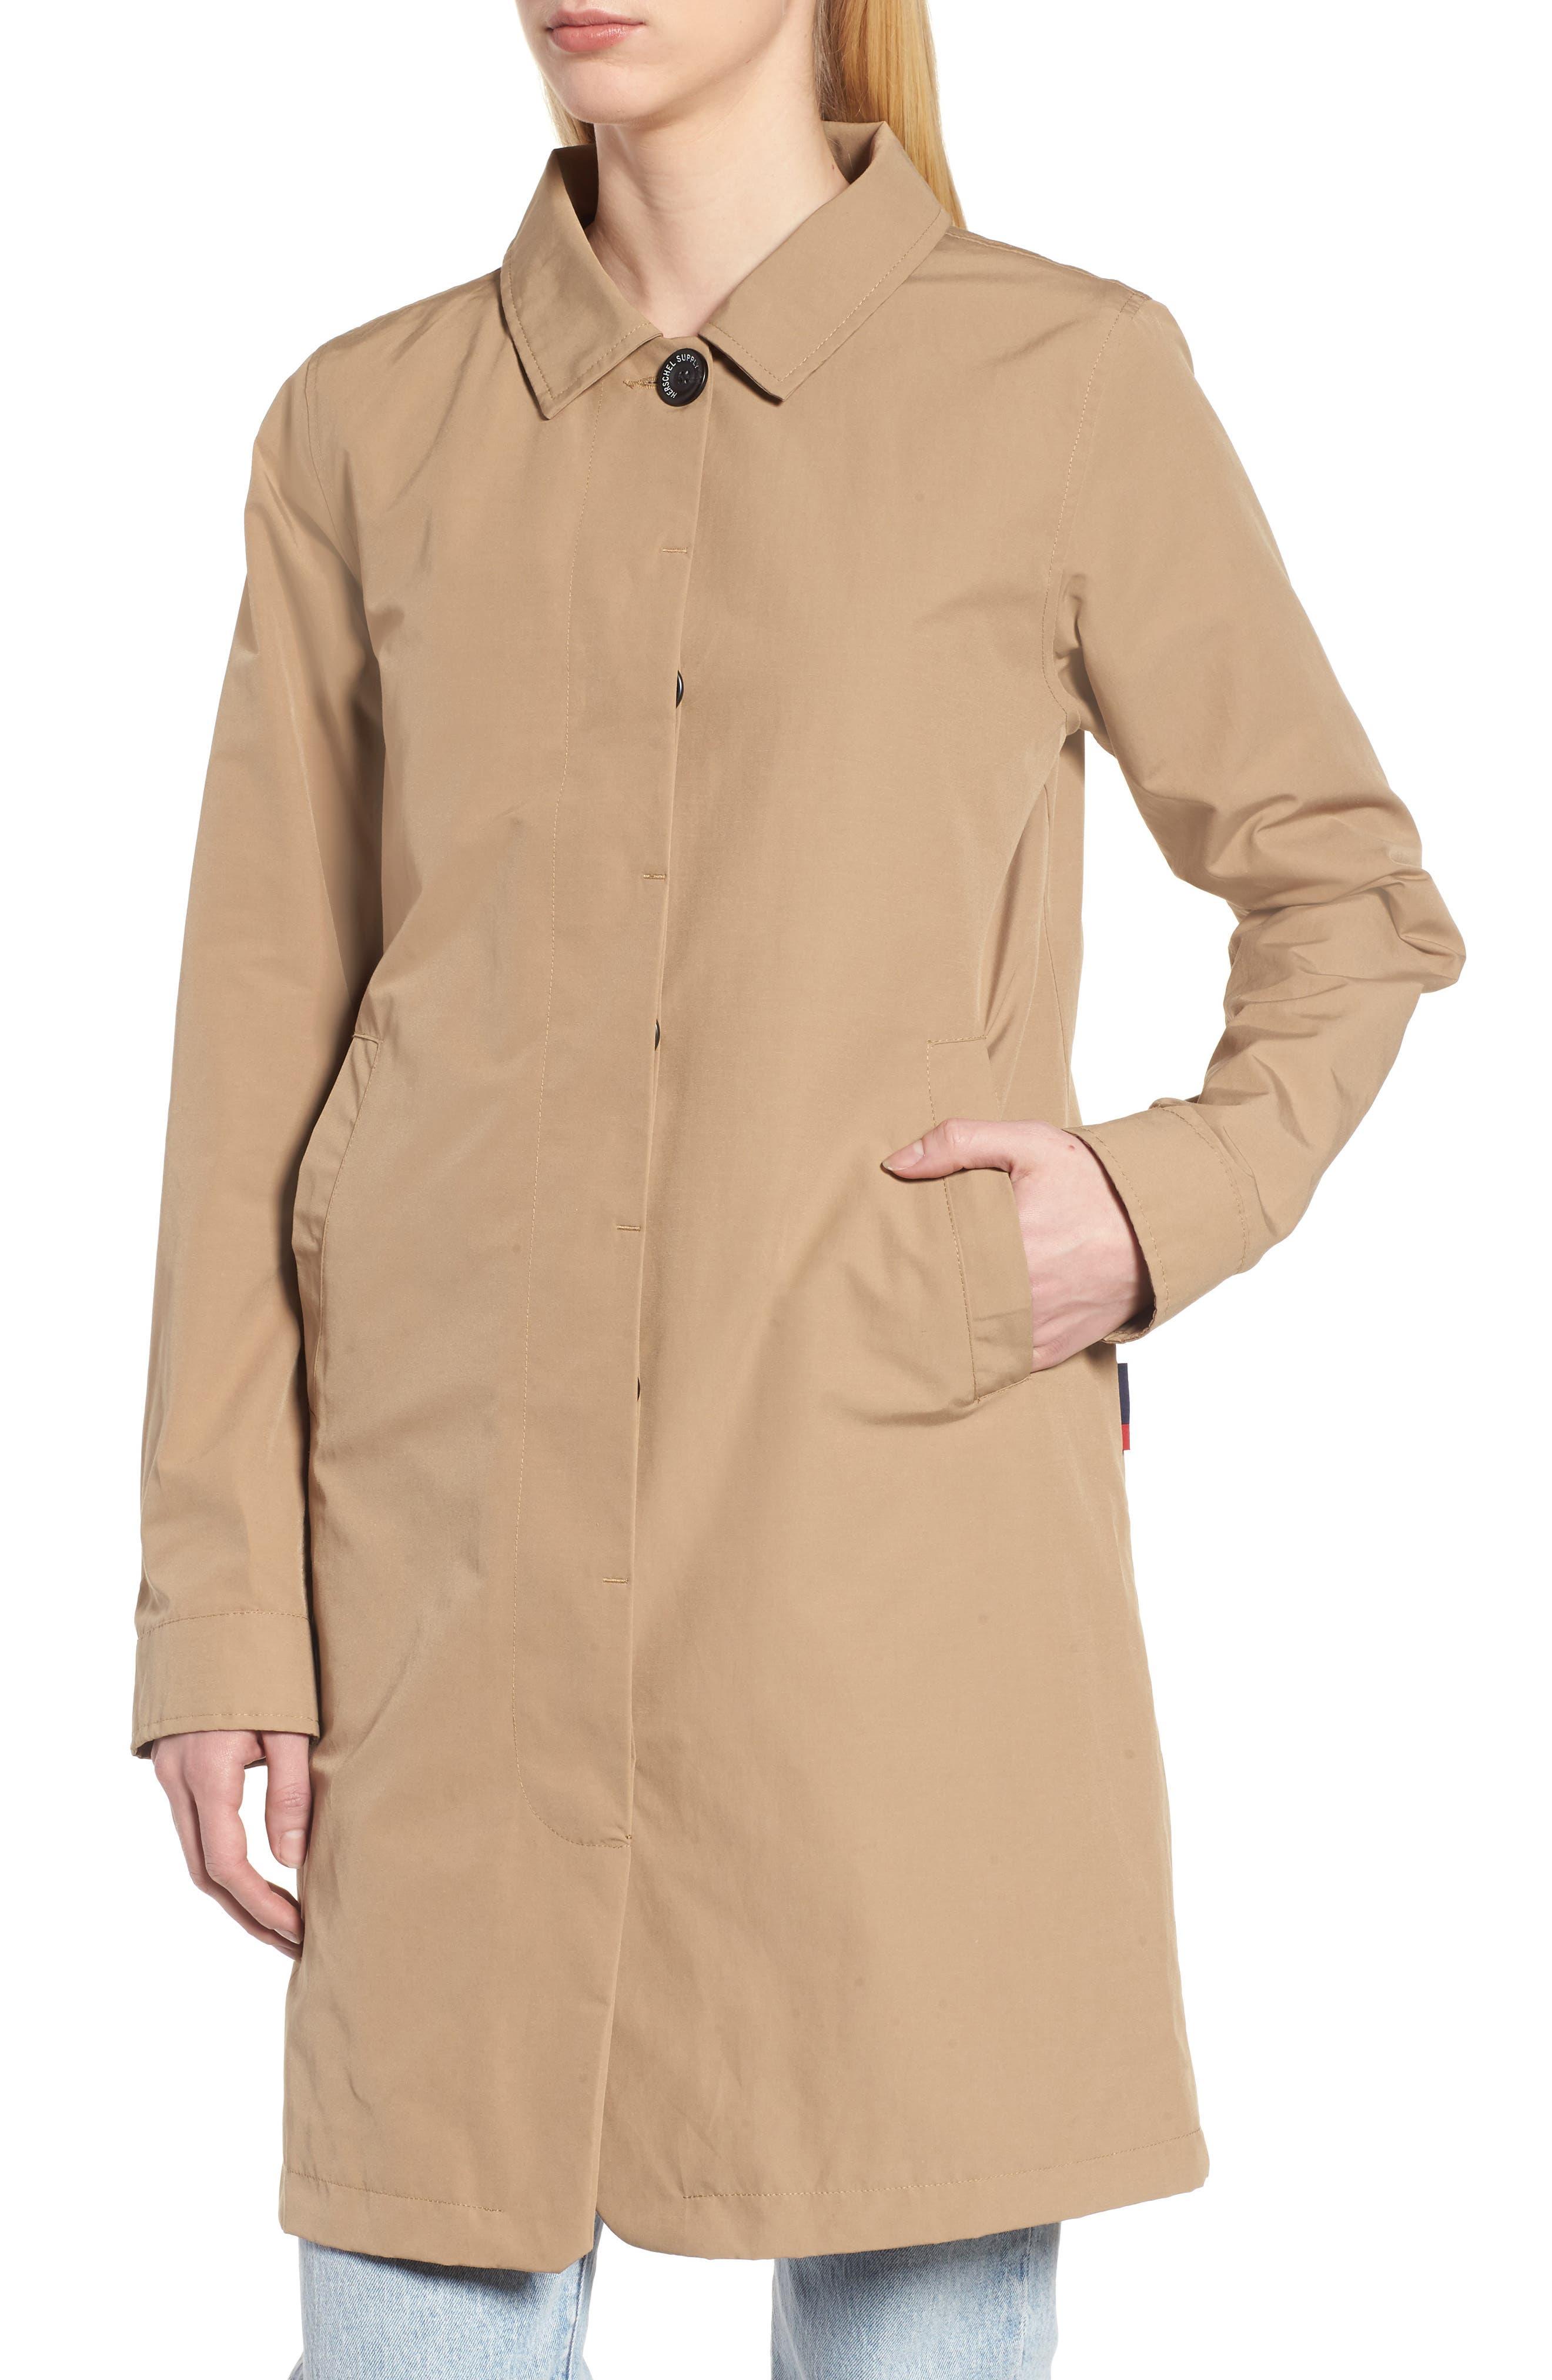 Mac Jacket,                             Alternate thumbnail 4, color,                             250